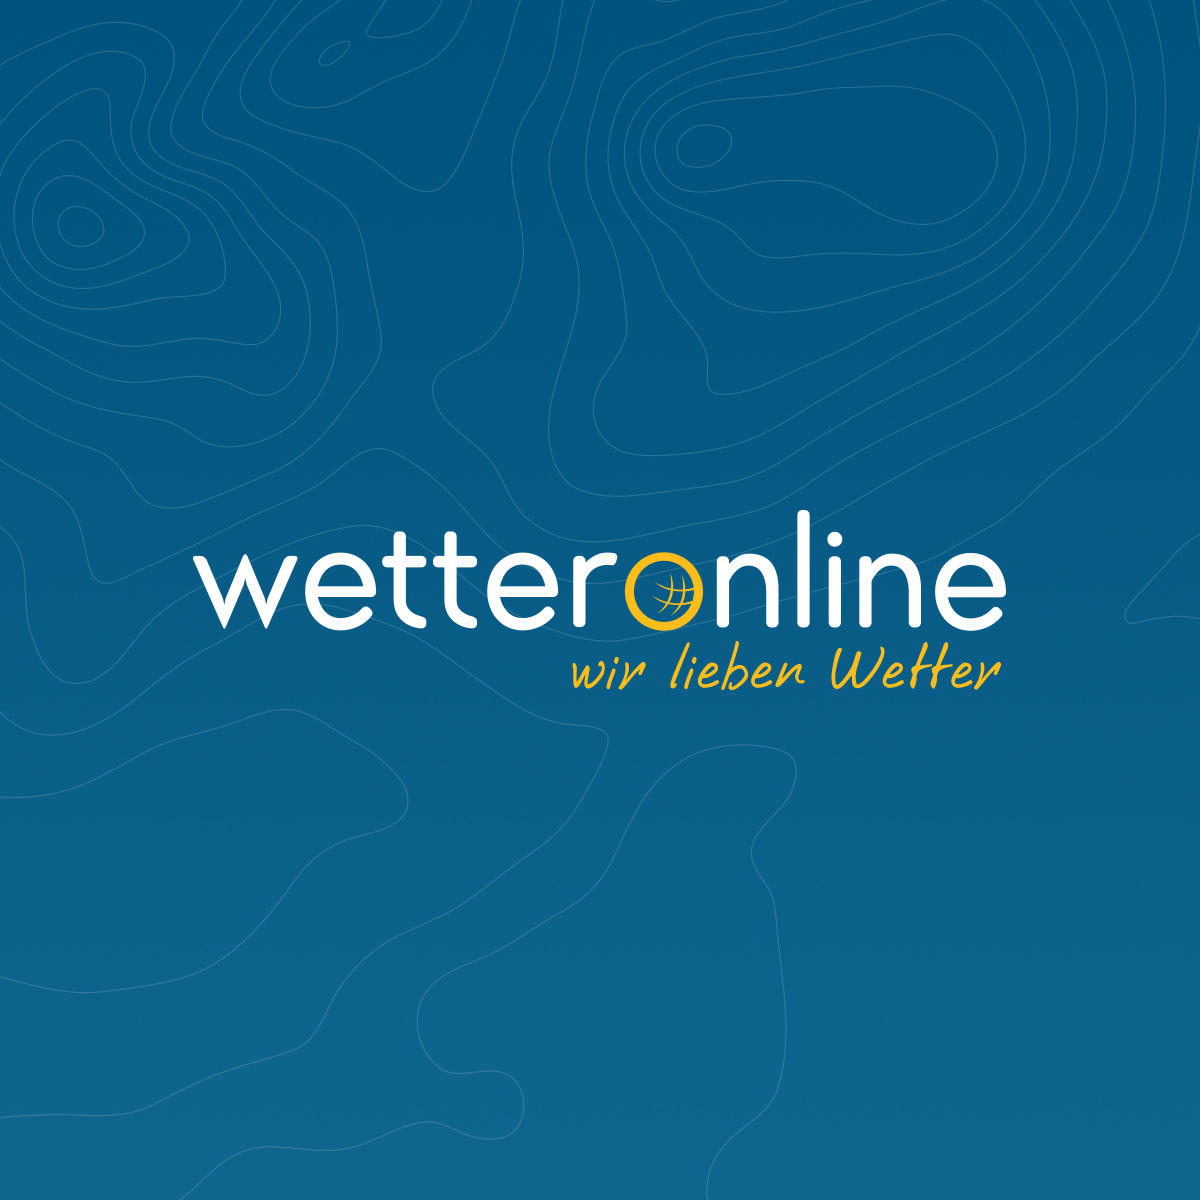 webcams deutschland karte Wetter Webcams Deutschland   Webcams weltweit   WetterOnline